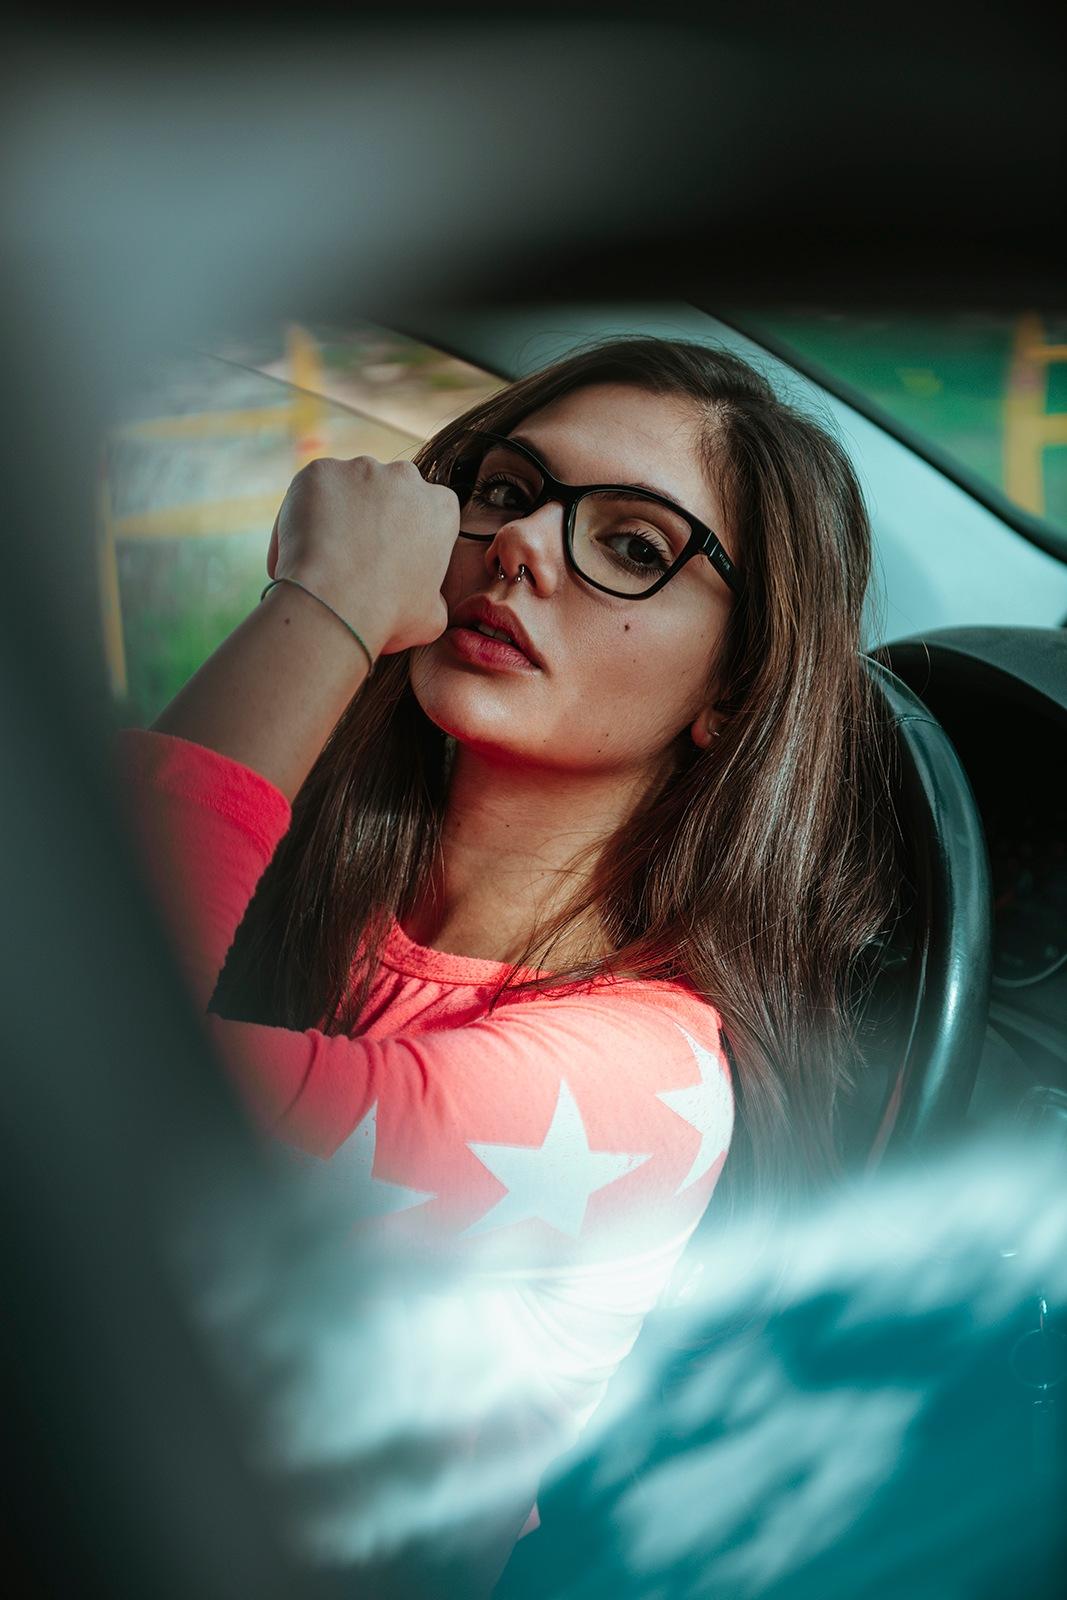 glasses by Sergio Derosas